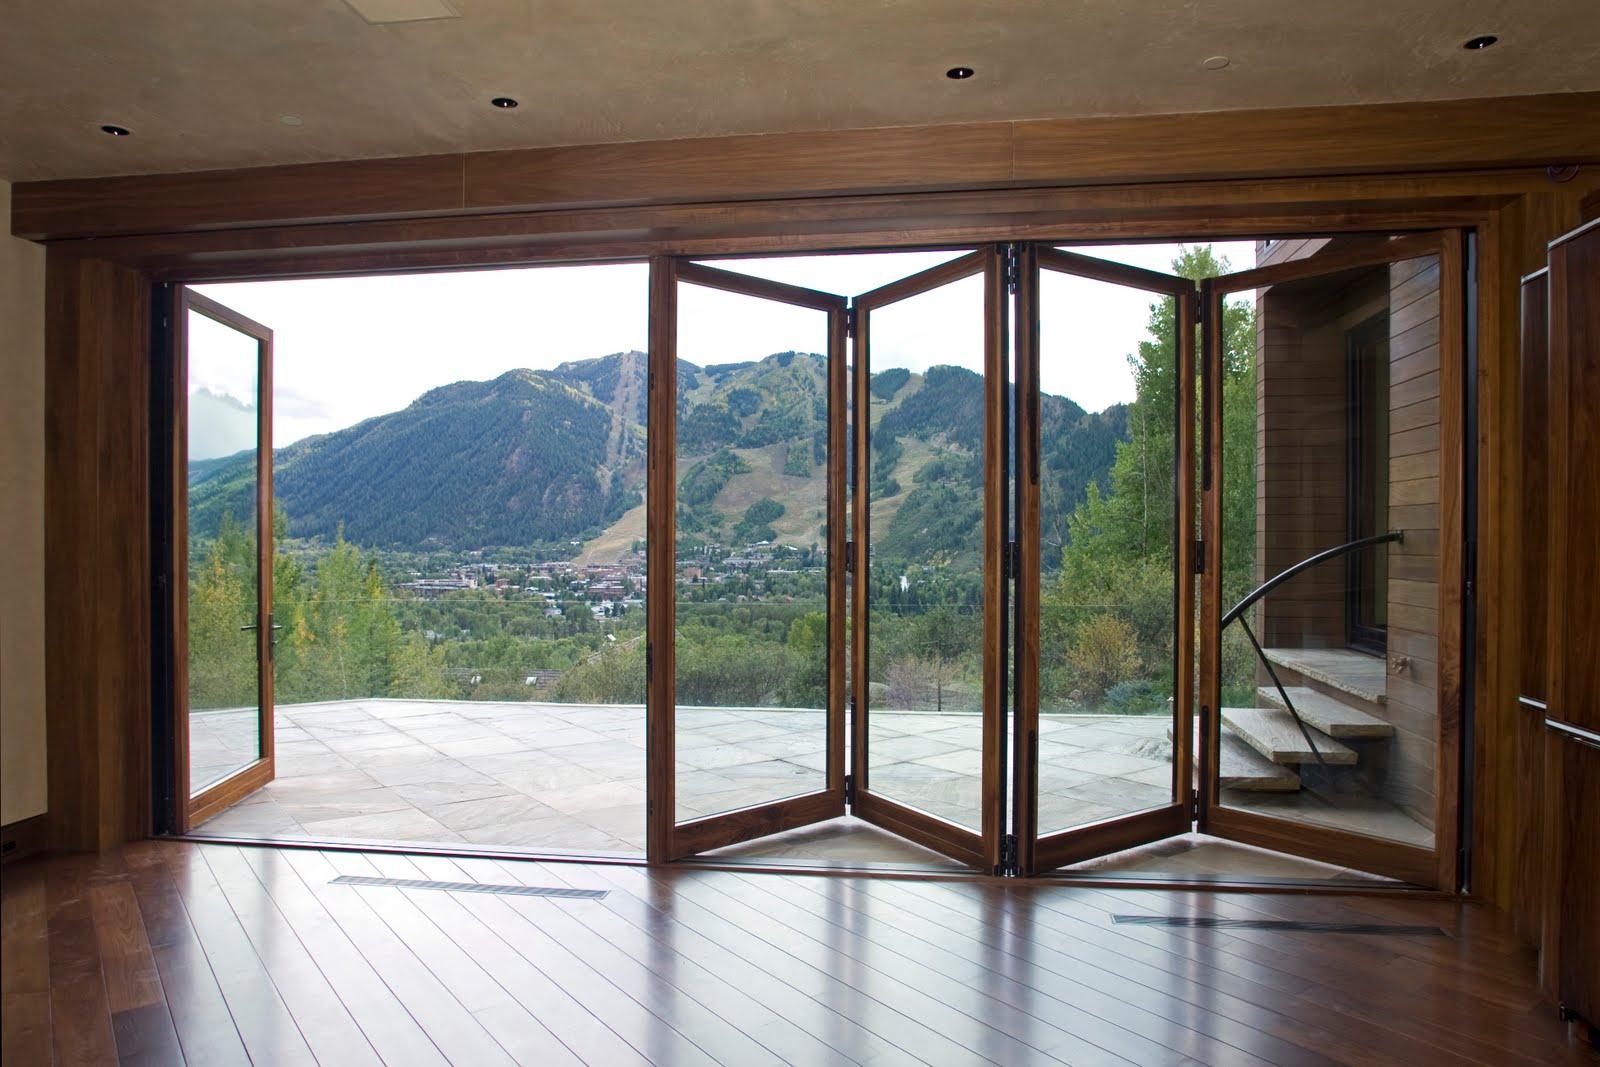 Accordion glass patio doors